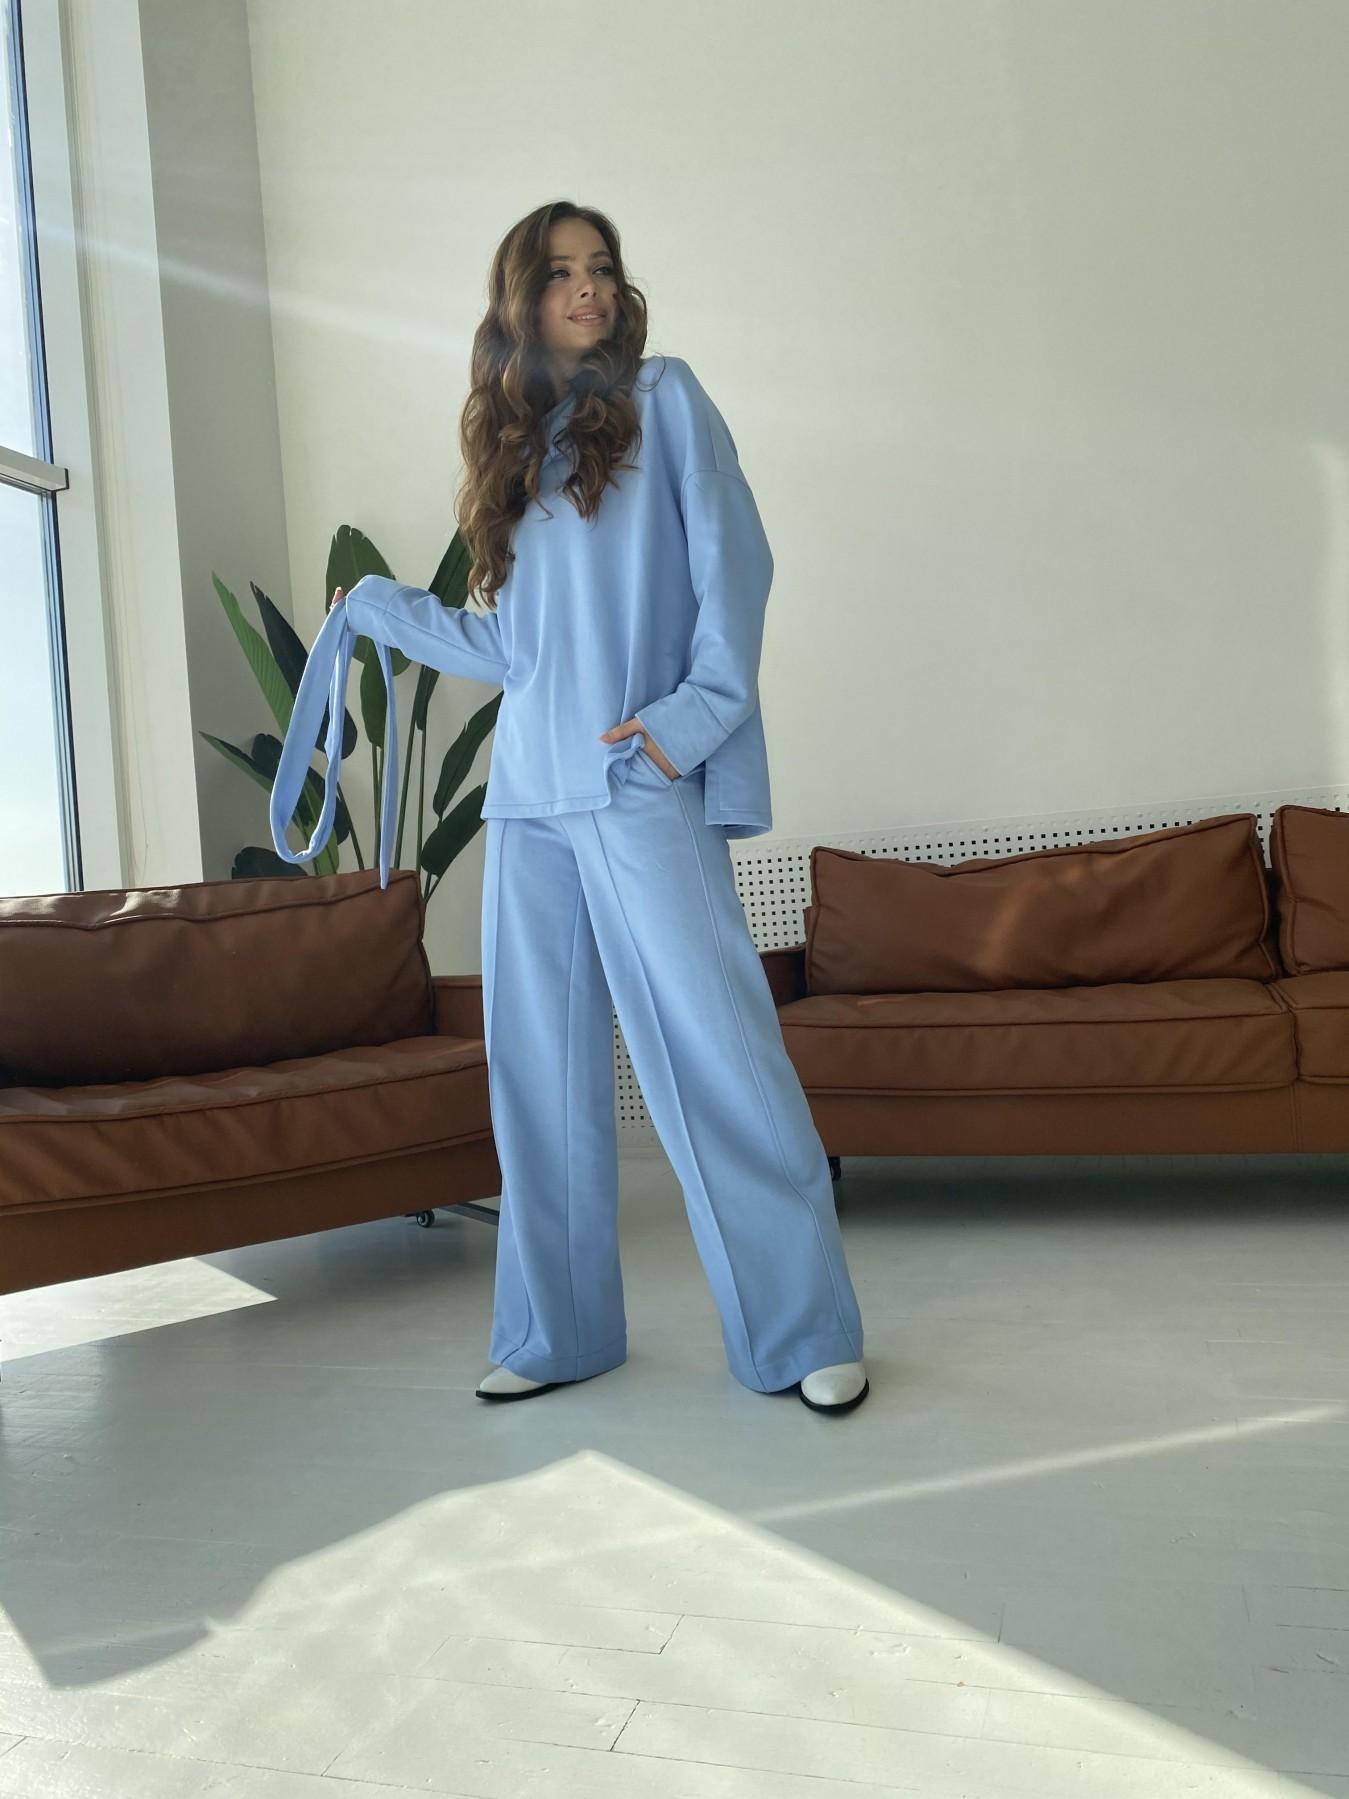 Джаст костюм Oversize  3х нитка 10564 АРТ. 47245 Цвет: Голубой - фото 6, интернет магазин tm-modus.ru